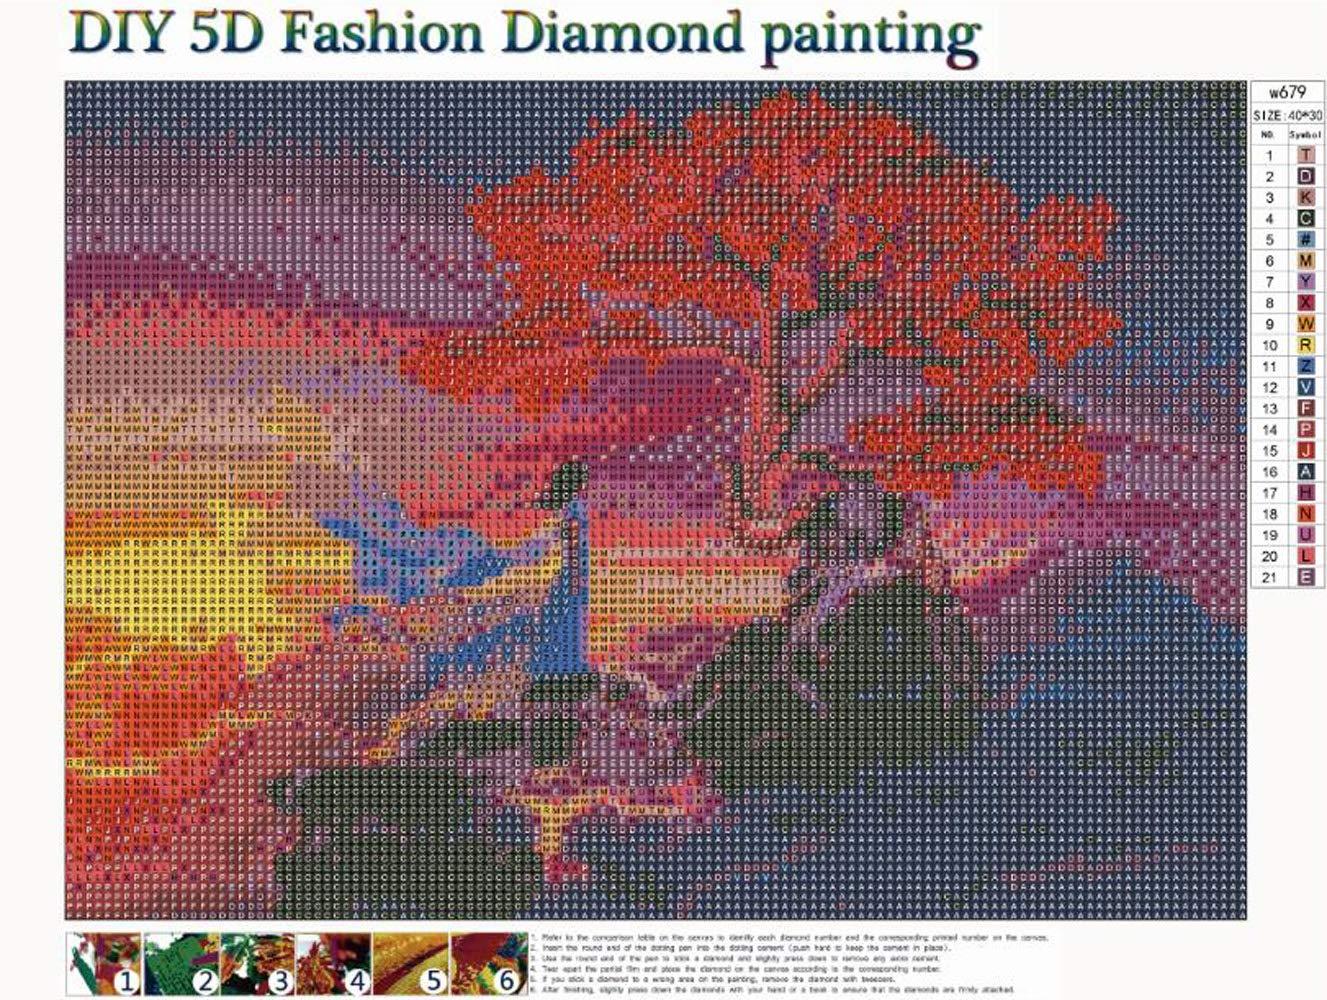 Amazon.com: MXJSUA 5D DIY Diamond Painting by Number Kit ...